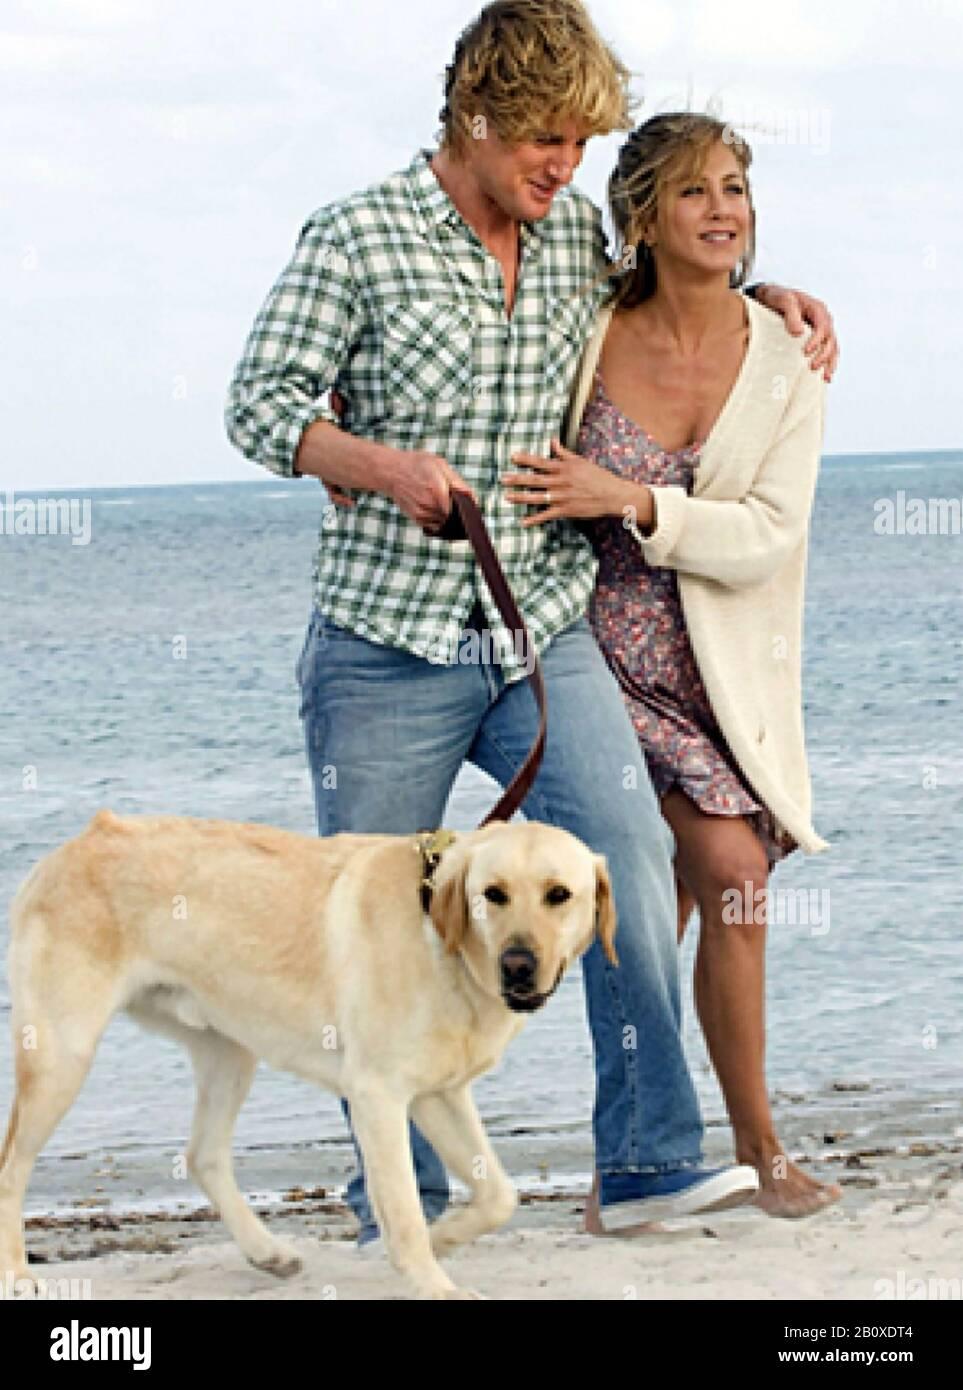 Marley Me 2008 20th Century Fox Film With Owen Wilson And Jennifer Aniston Stock Photo Alamy